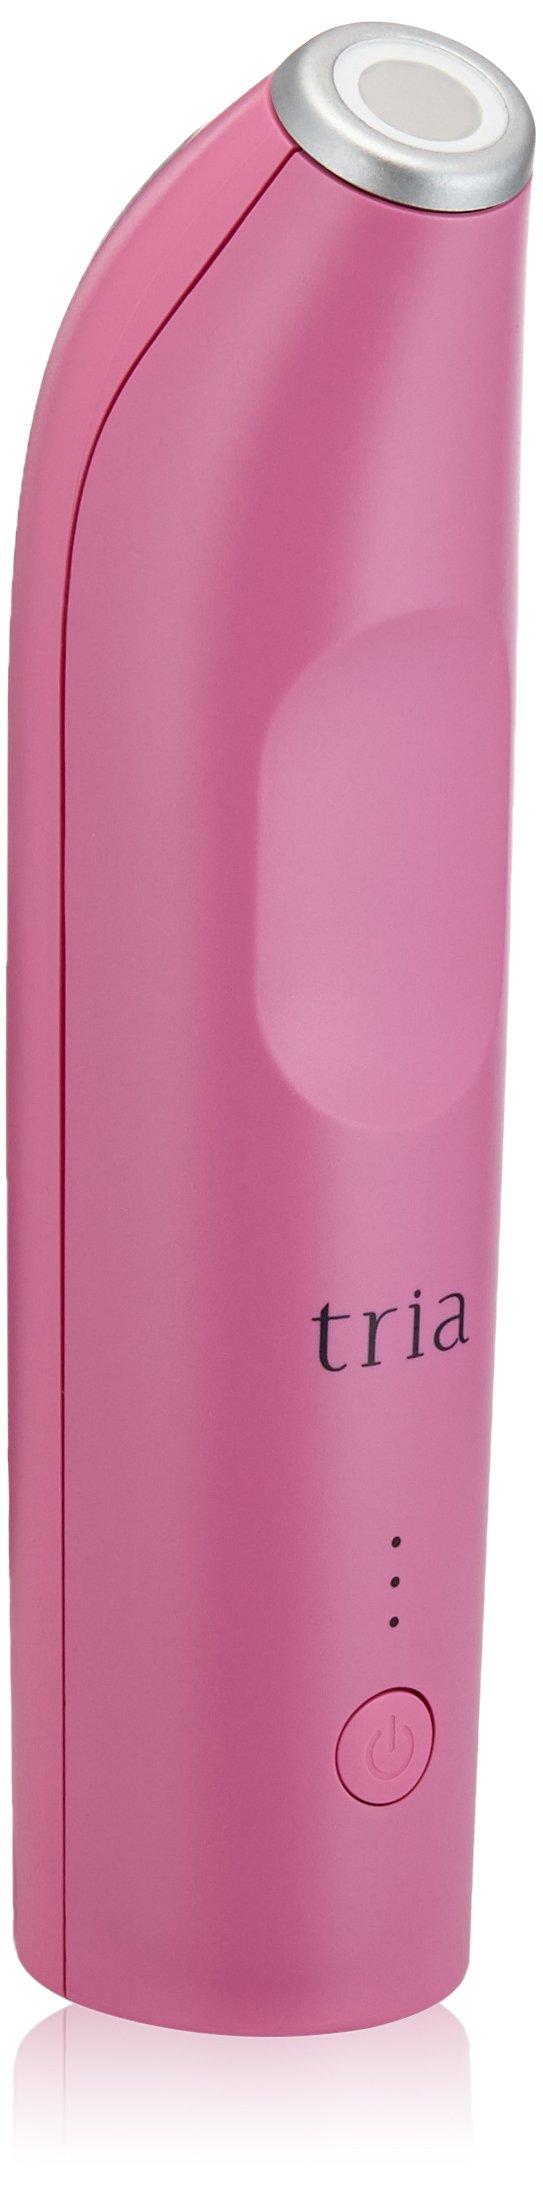 Tria Beauty Hair Removal Laser Precision, Blossom